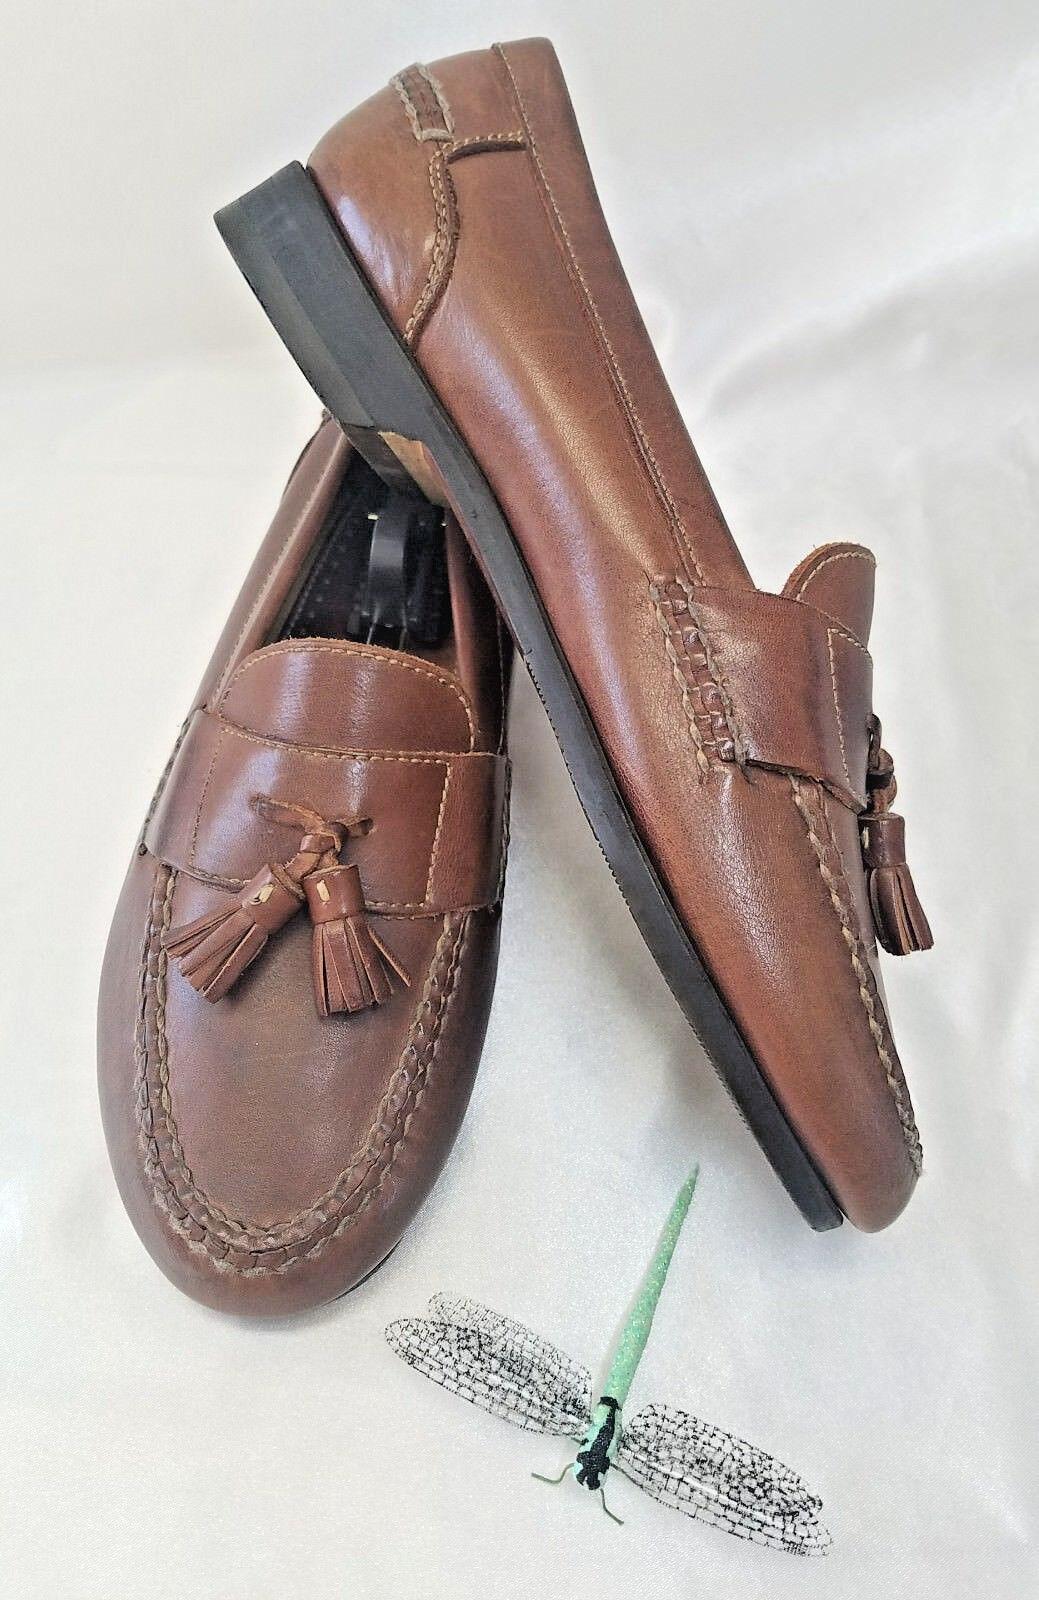 Johnston & Murphy Mens Slip-on Tassel Loafers Brown Leather Sz 9M(US)